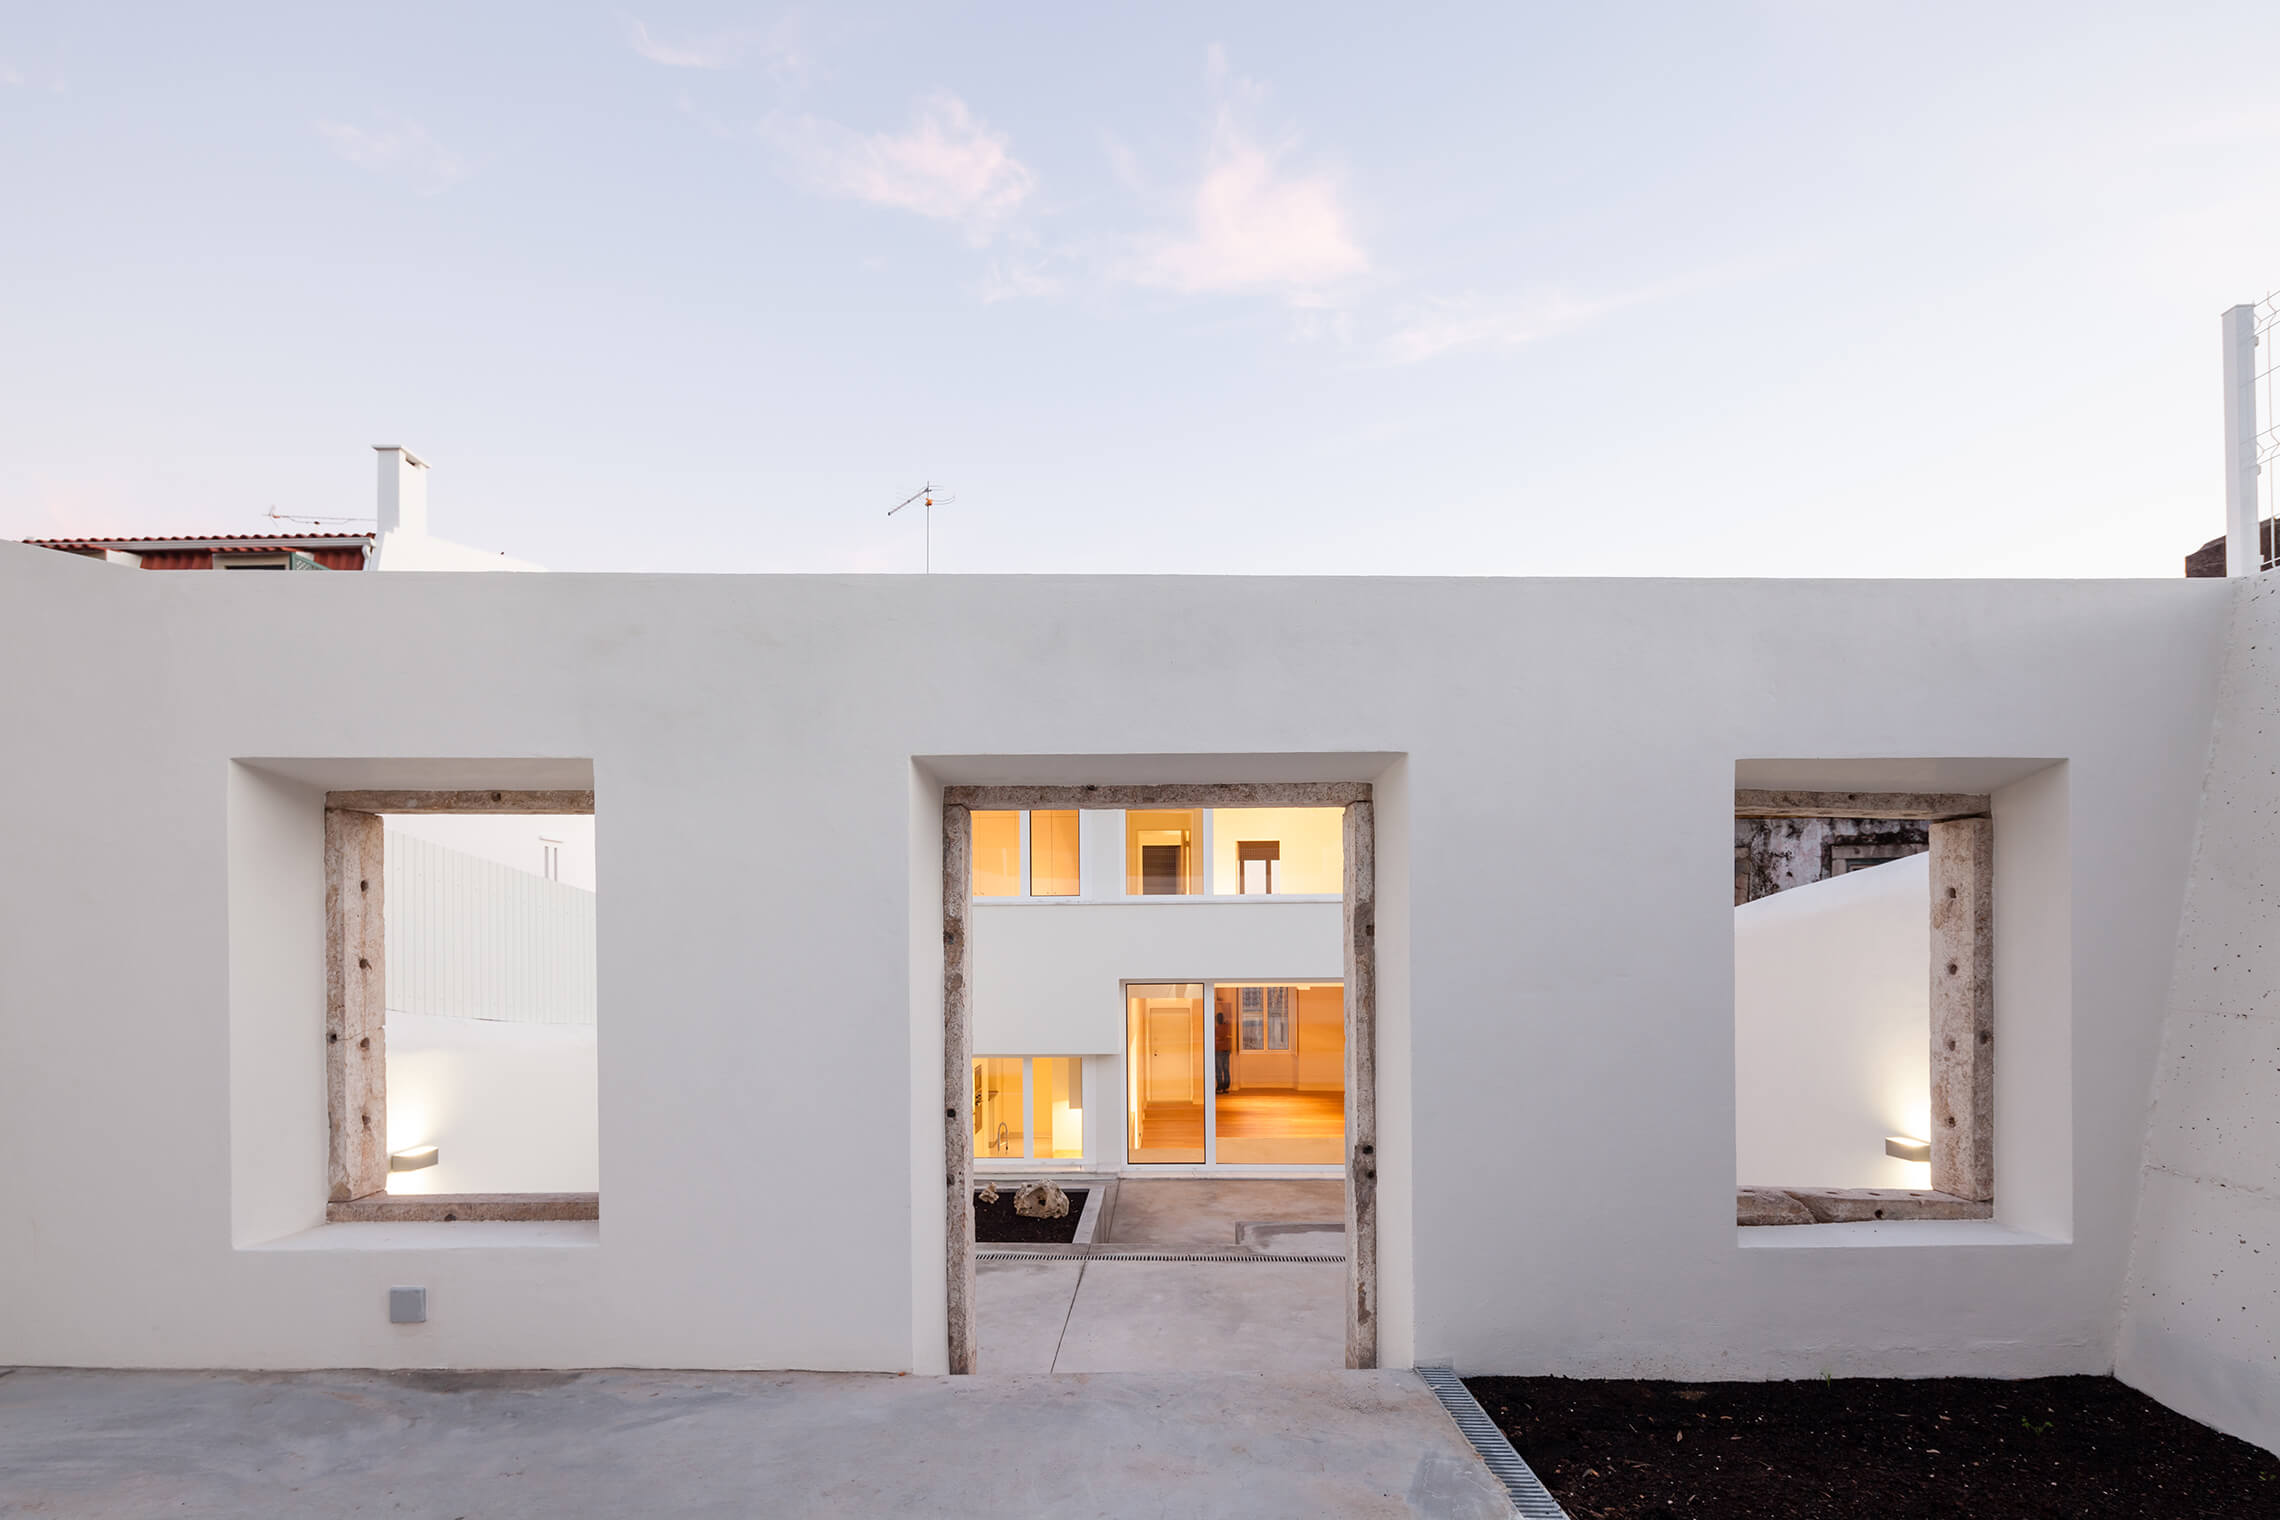 CAIS / House Refurbishment in Ajuda / Lisboa, Portugal / 2015